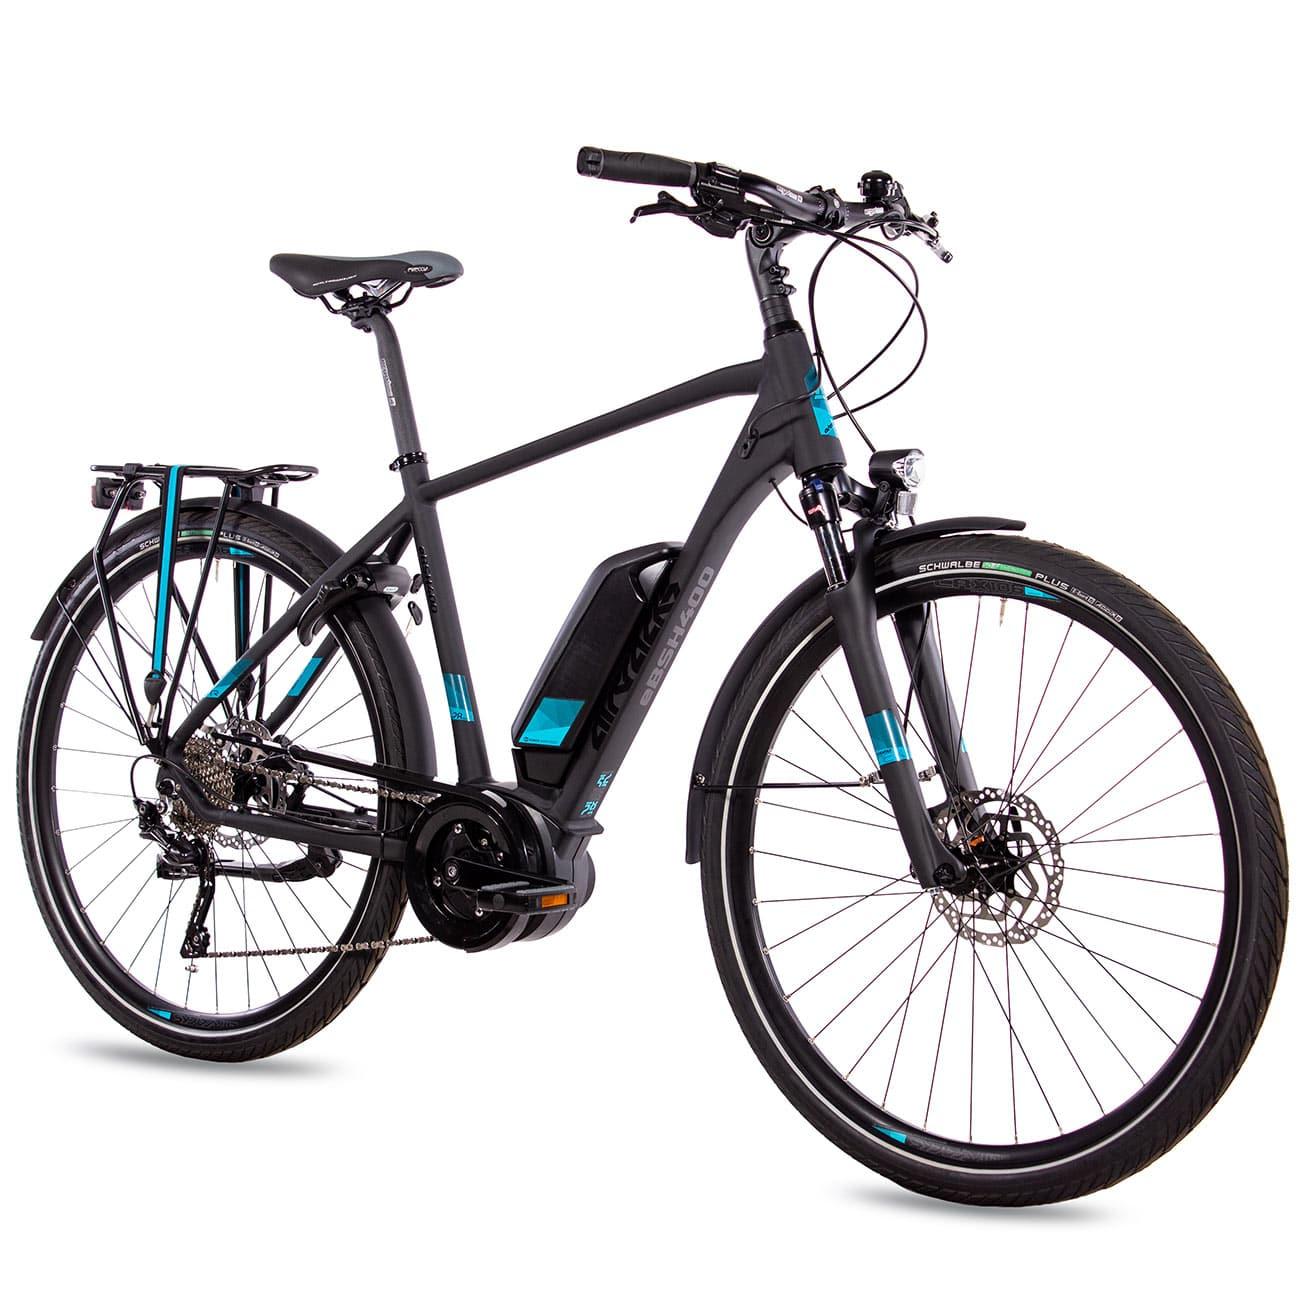 herren fahrrad 28 zoll e bike trekkingrad cityrad herrenfahrrad rahmenh he 60 52 48 cm m l xl. Black Bedroom Furniture Sets. Home Design Ideas